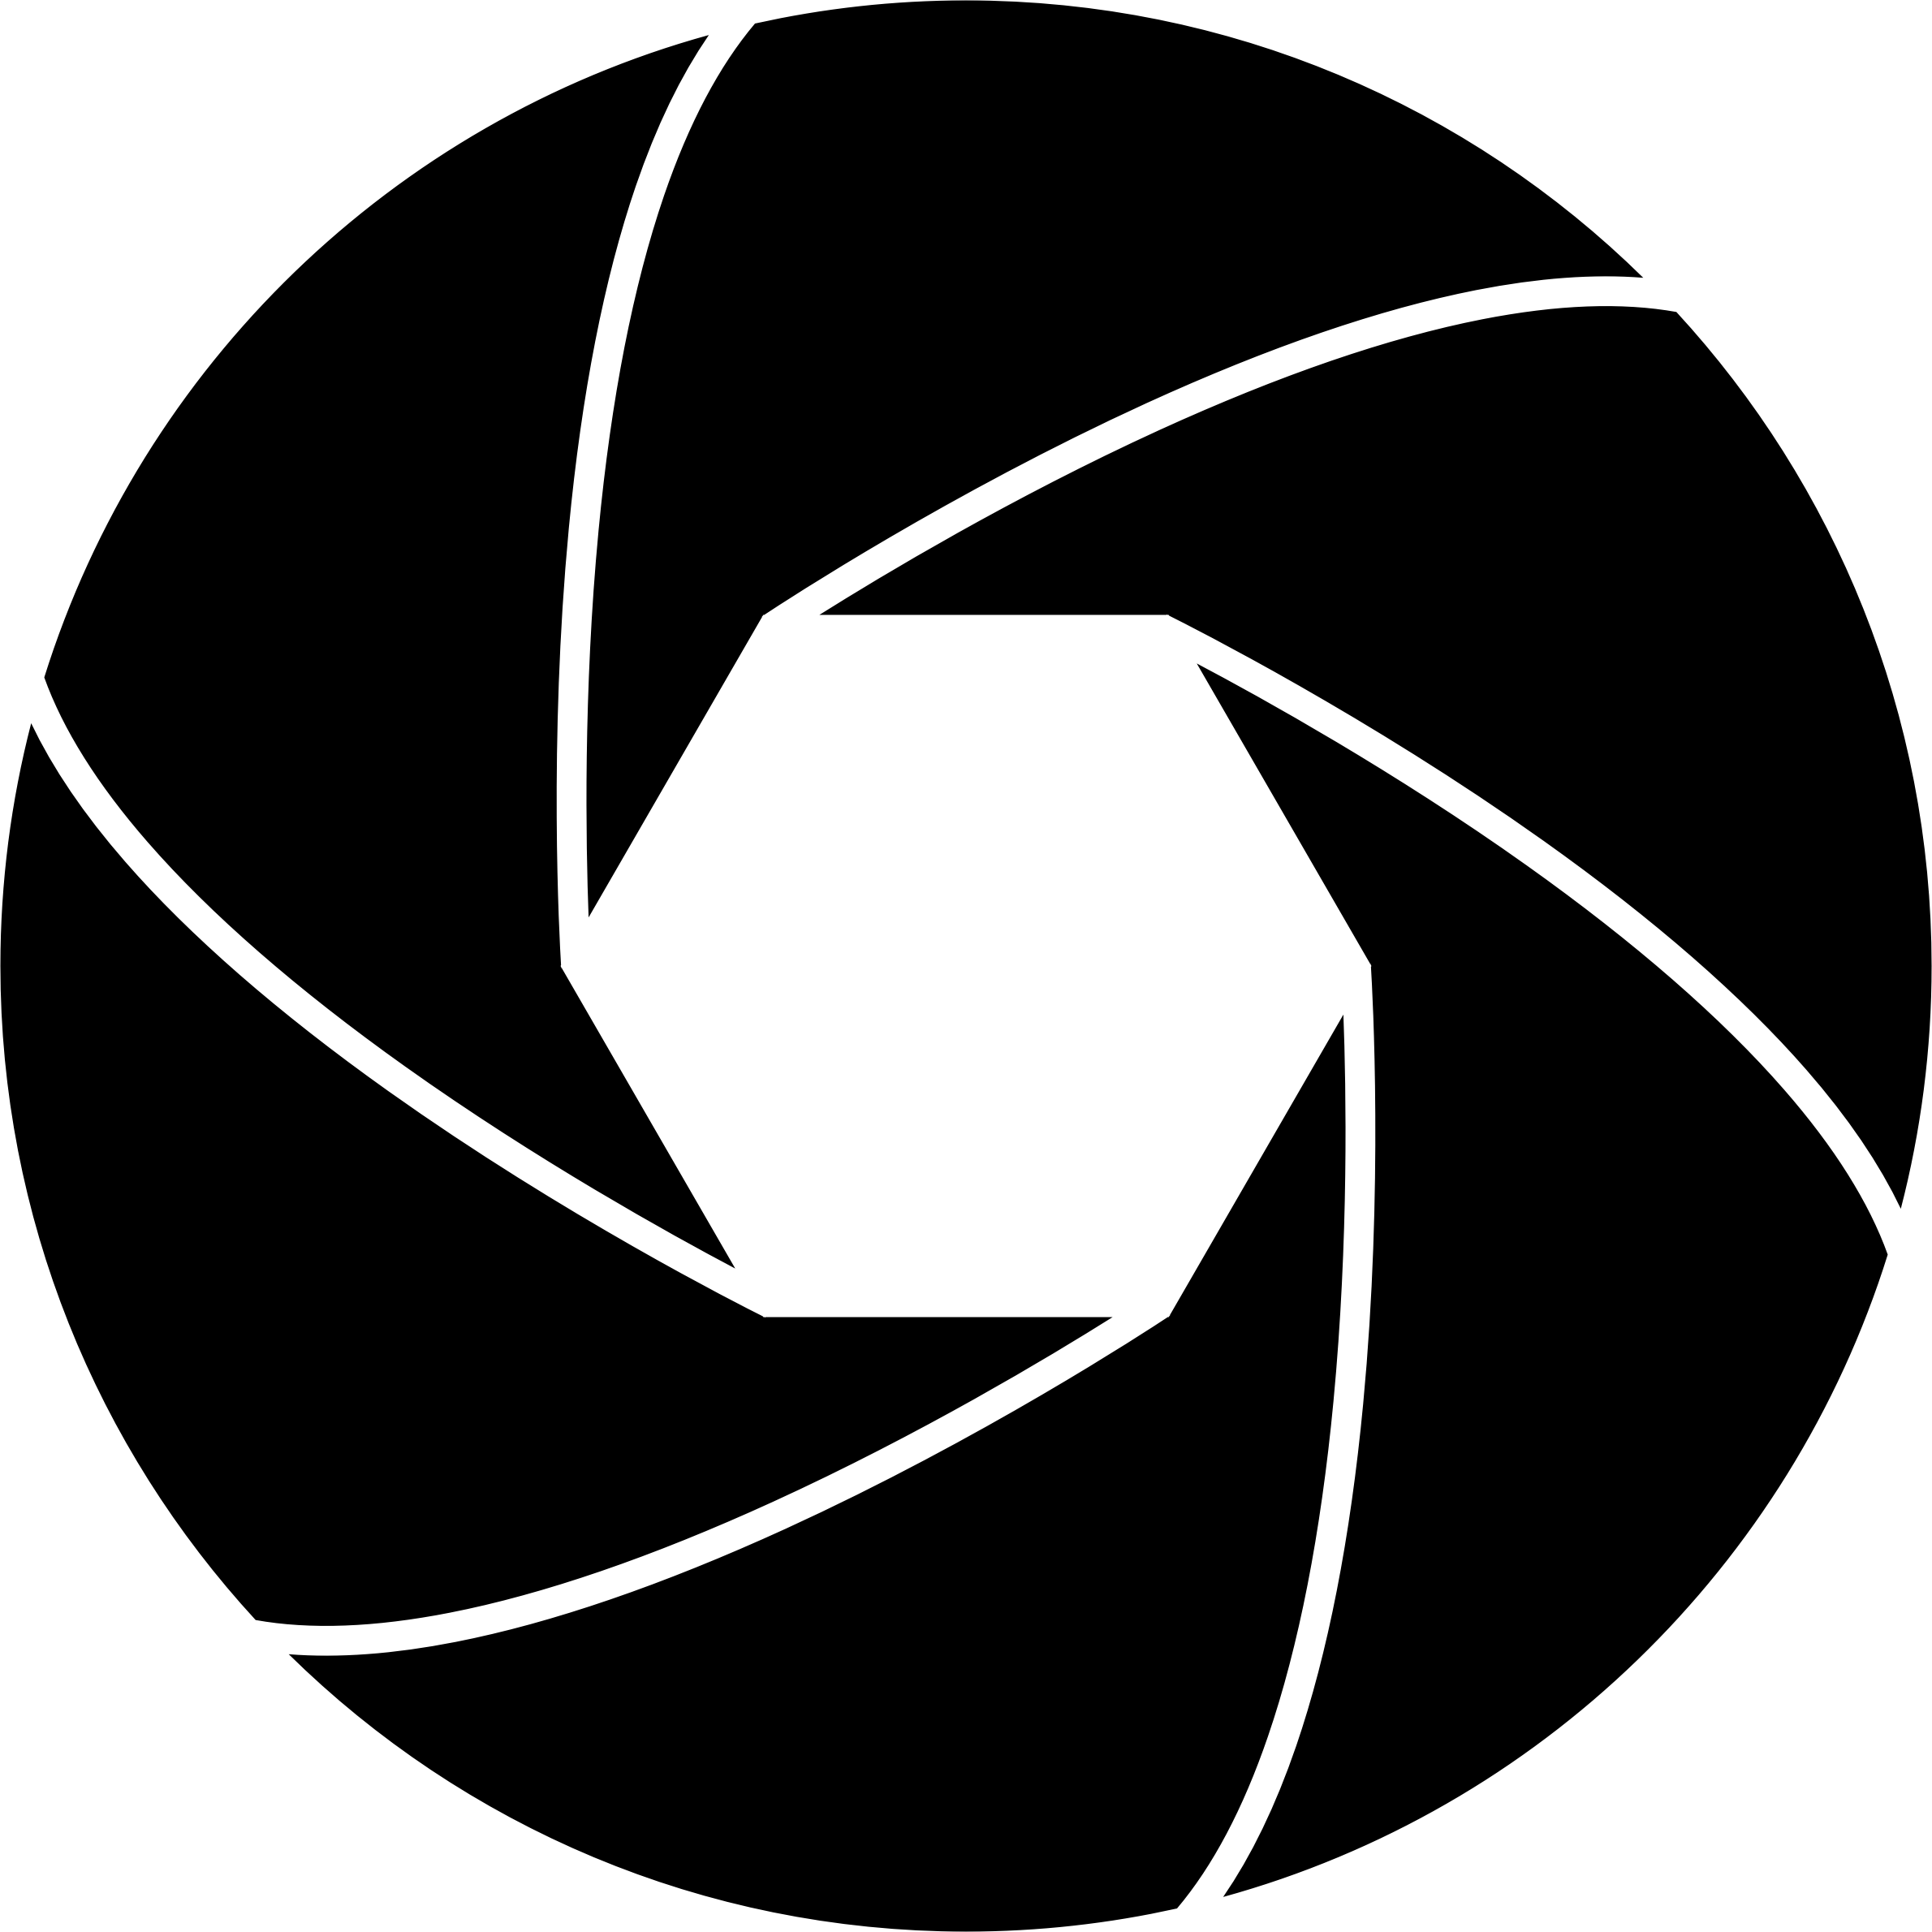 Lens clipart Black white art and clip